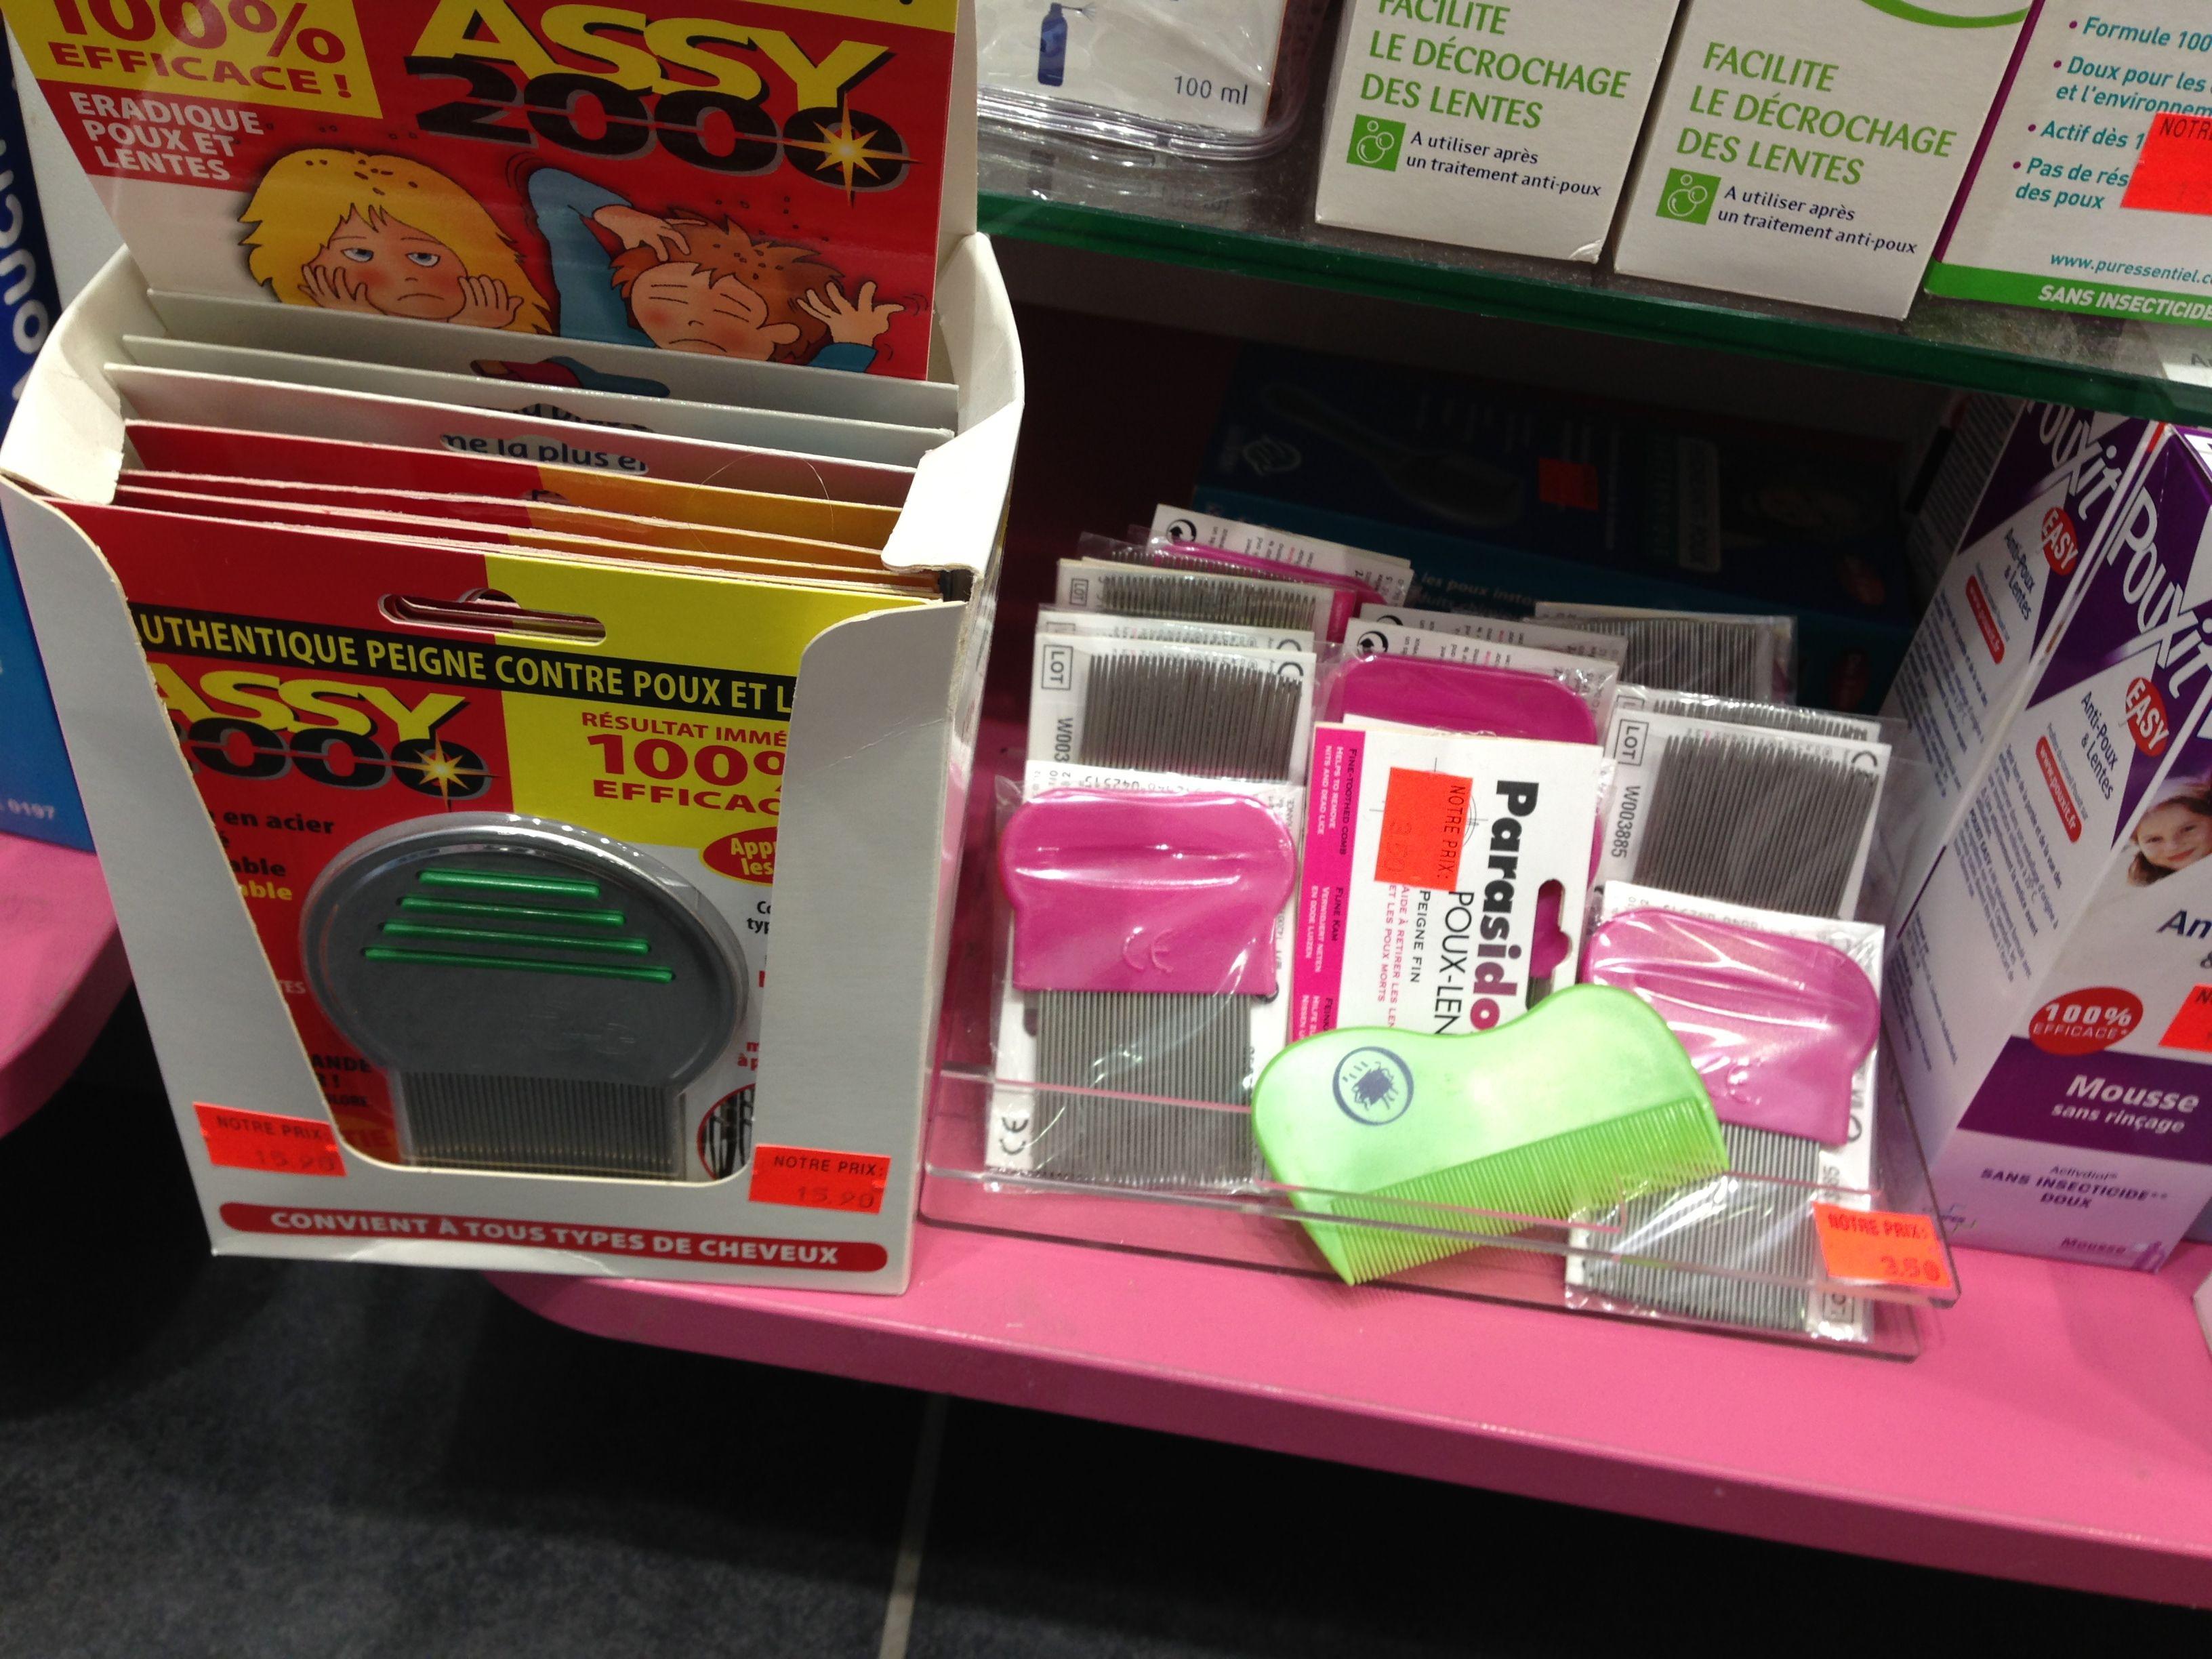 Lice removing supplies in Paris. Even Parisian children get lice.